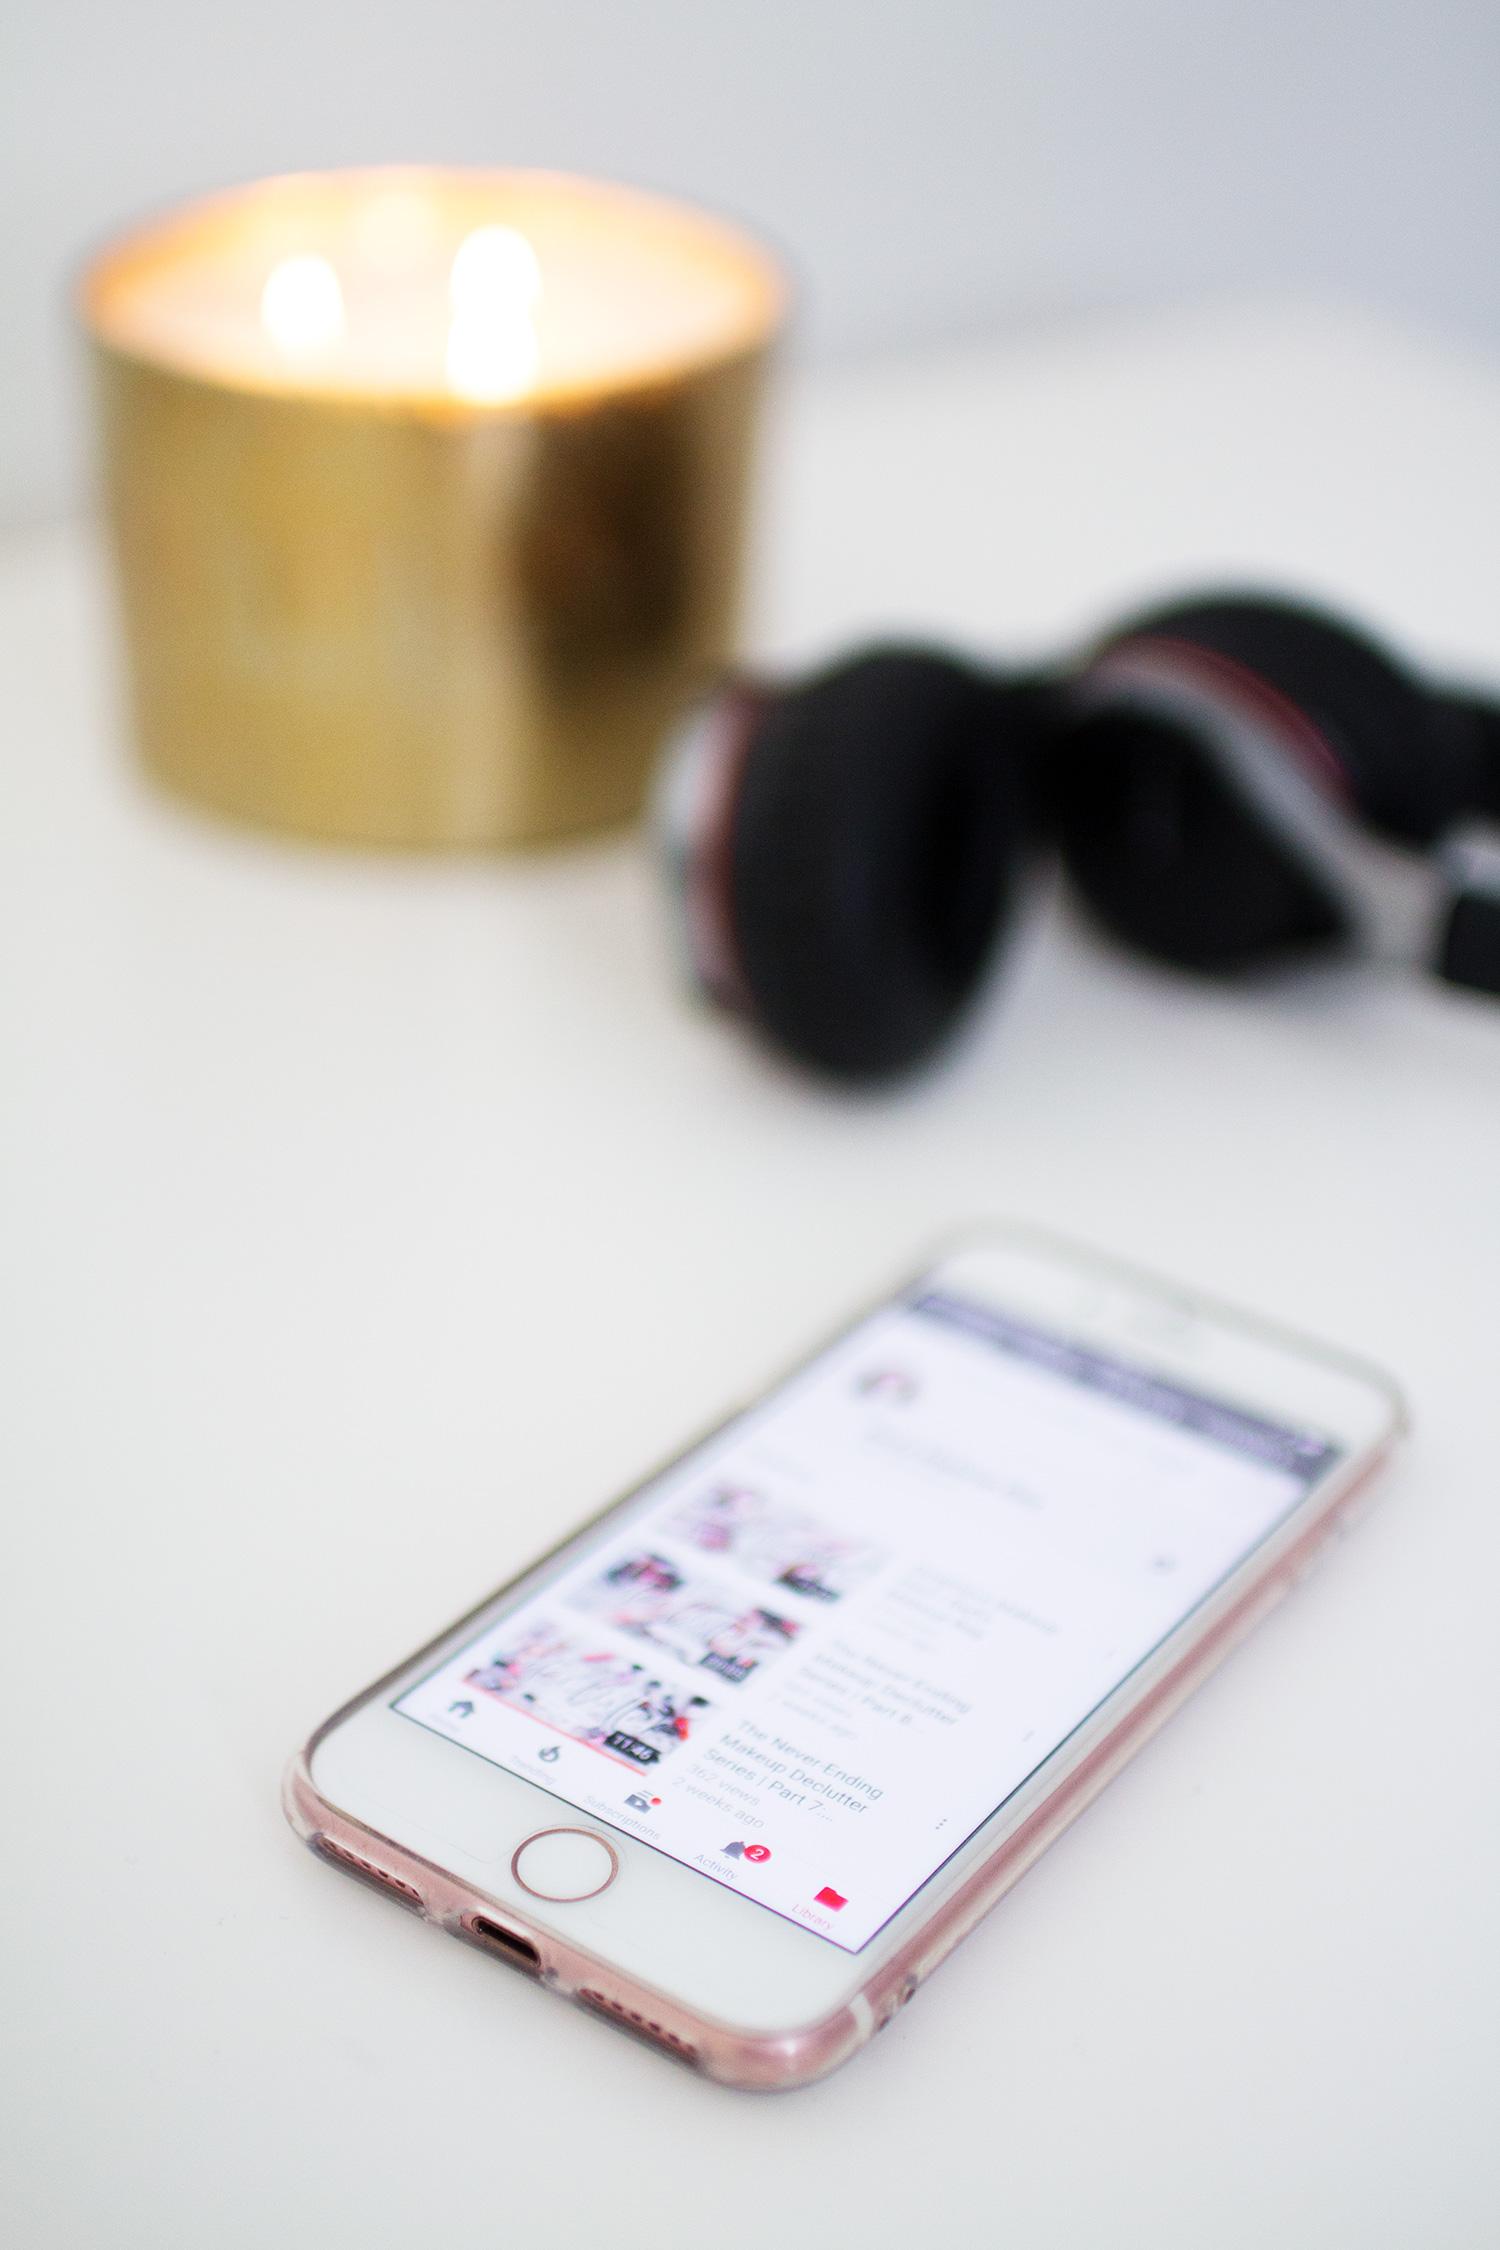 iPhone 7 on white desk